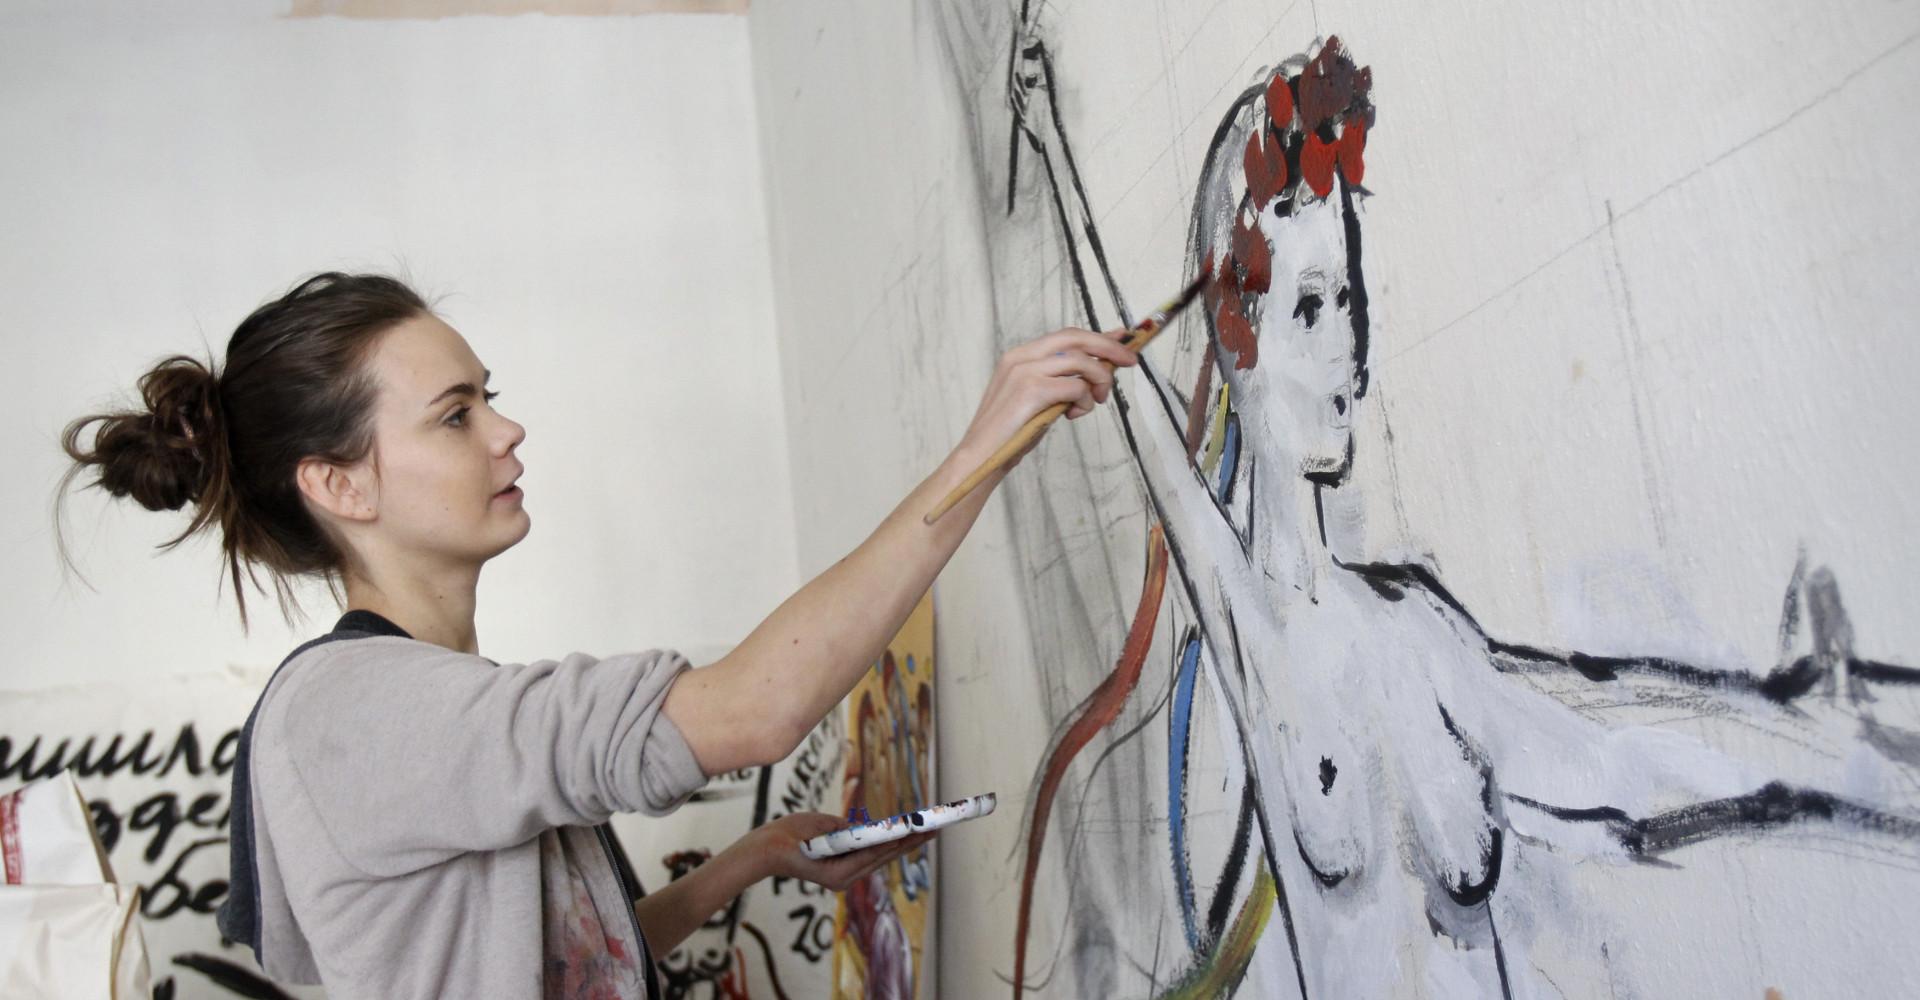 Qui était Oksana Shachko, la co-fondatrice des Femen?